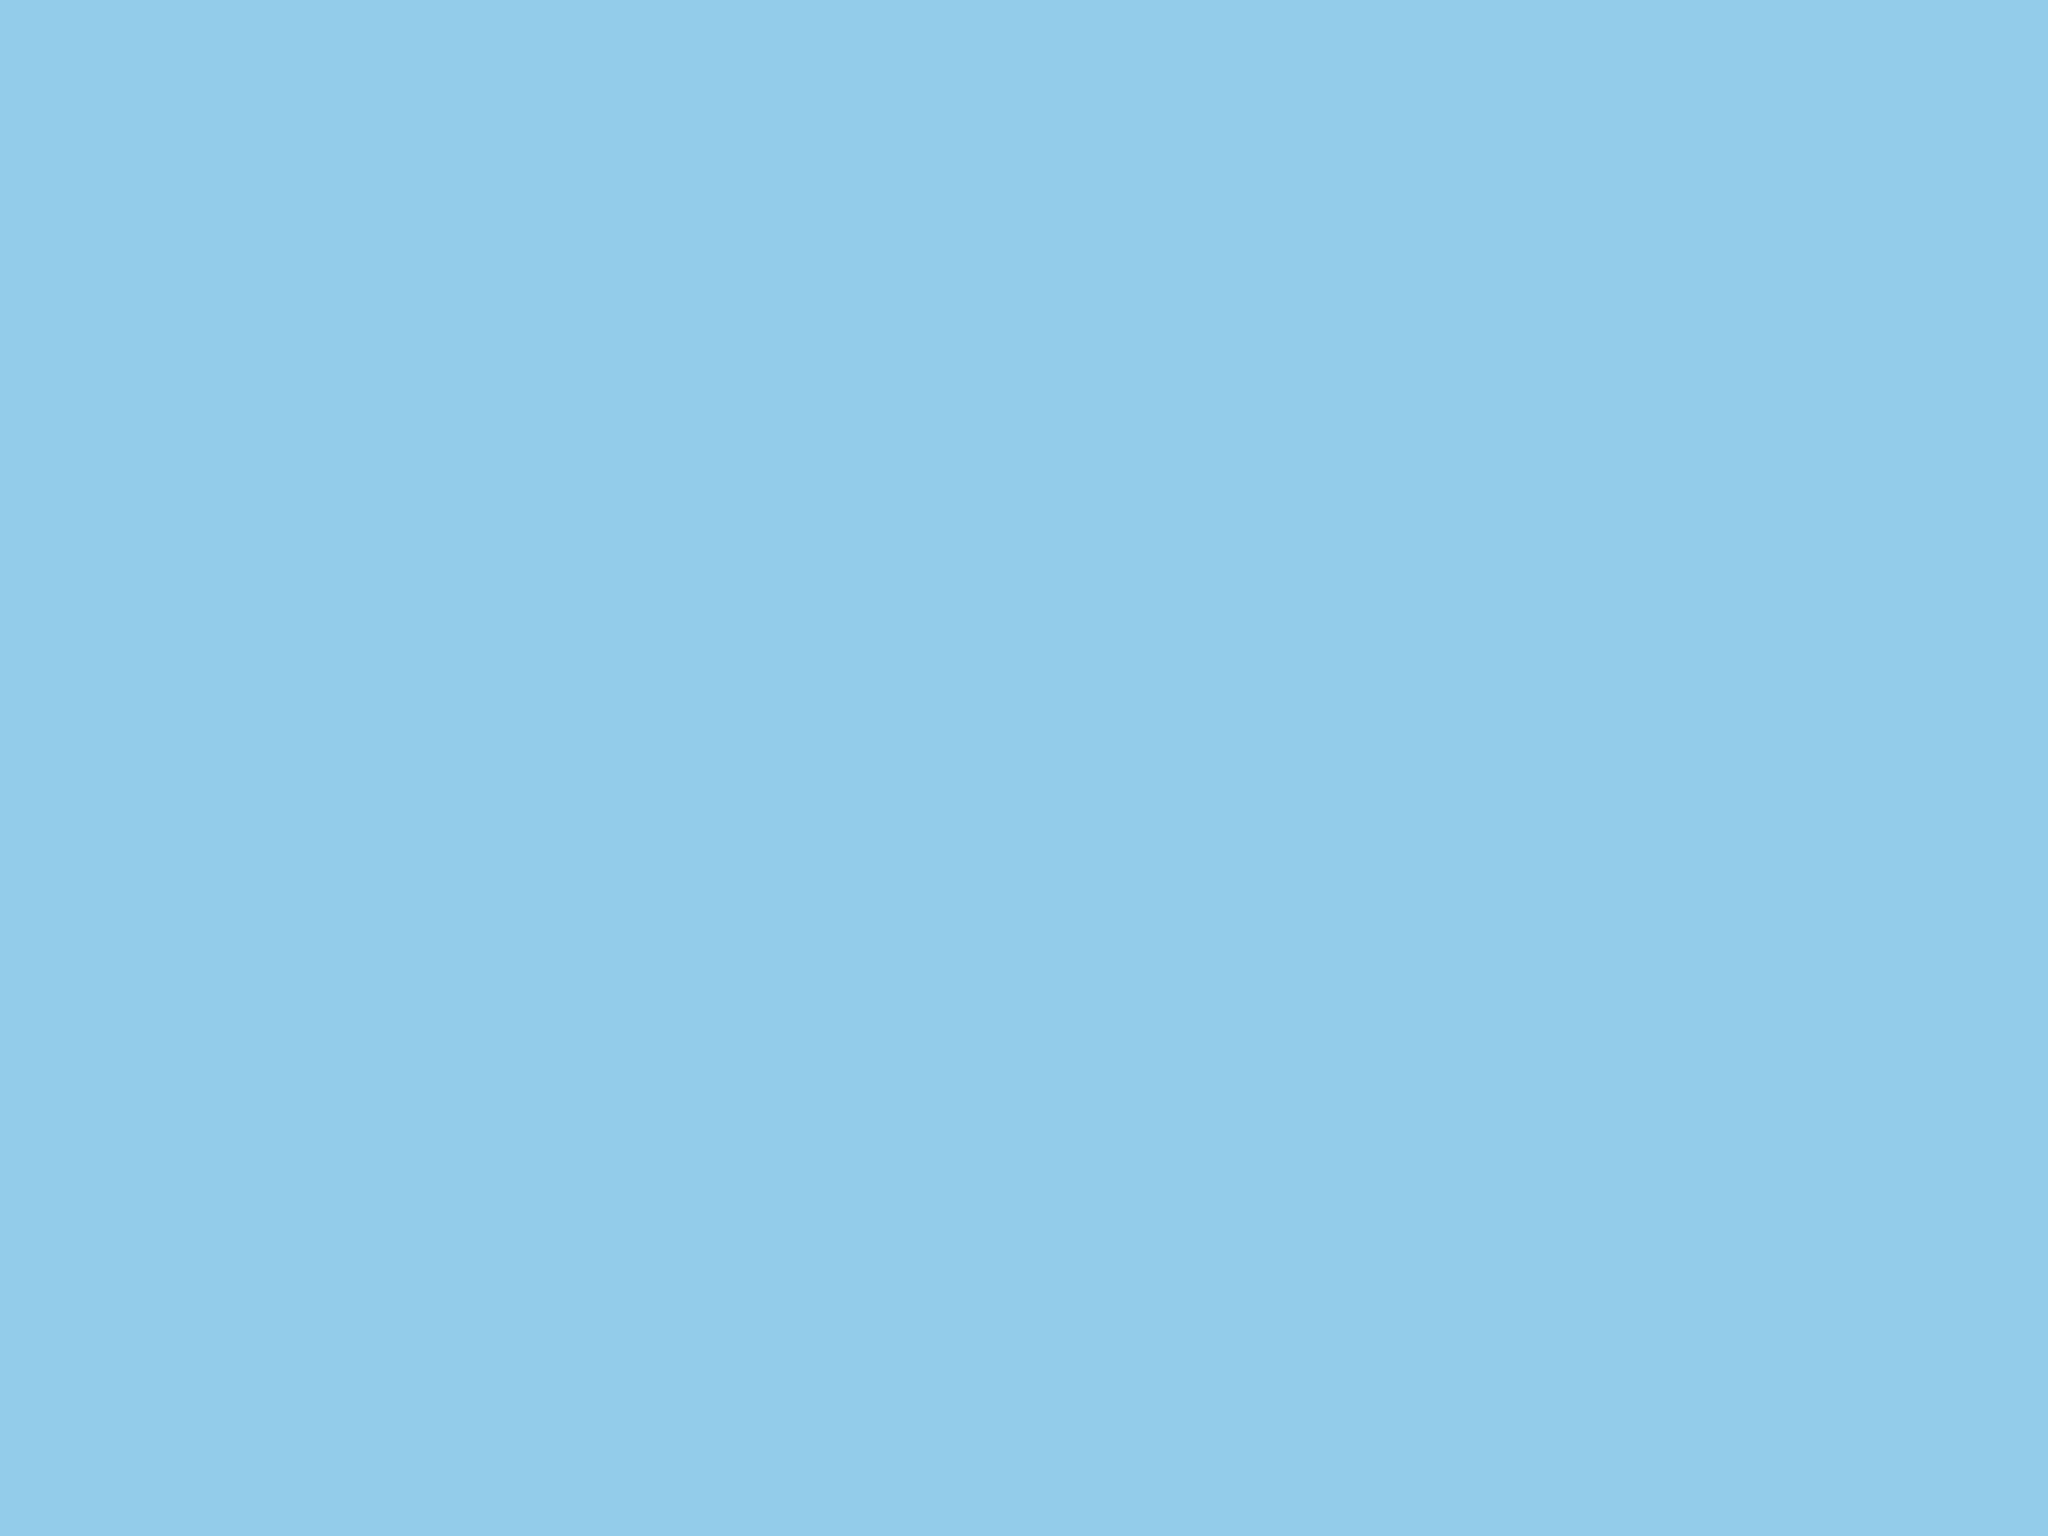 2048x1536 Light Cornflower Blue Solid Color Background